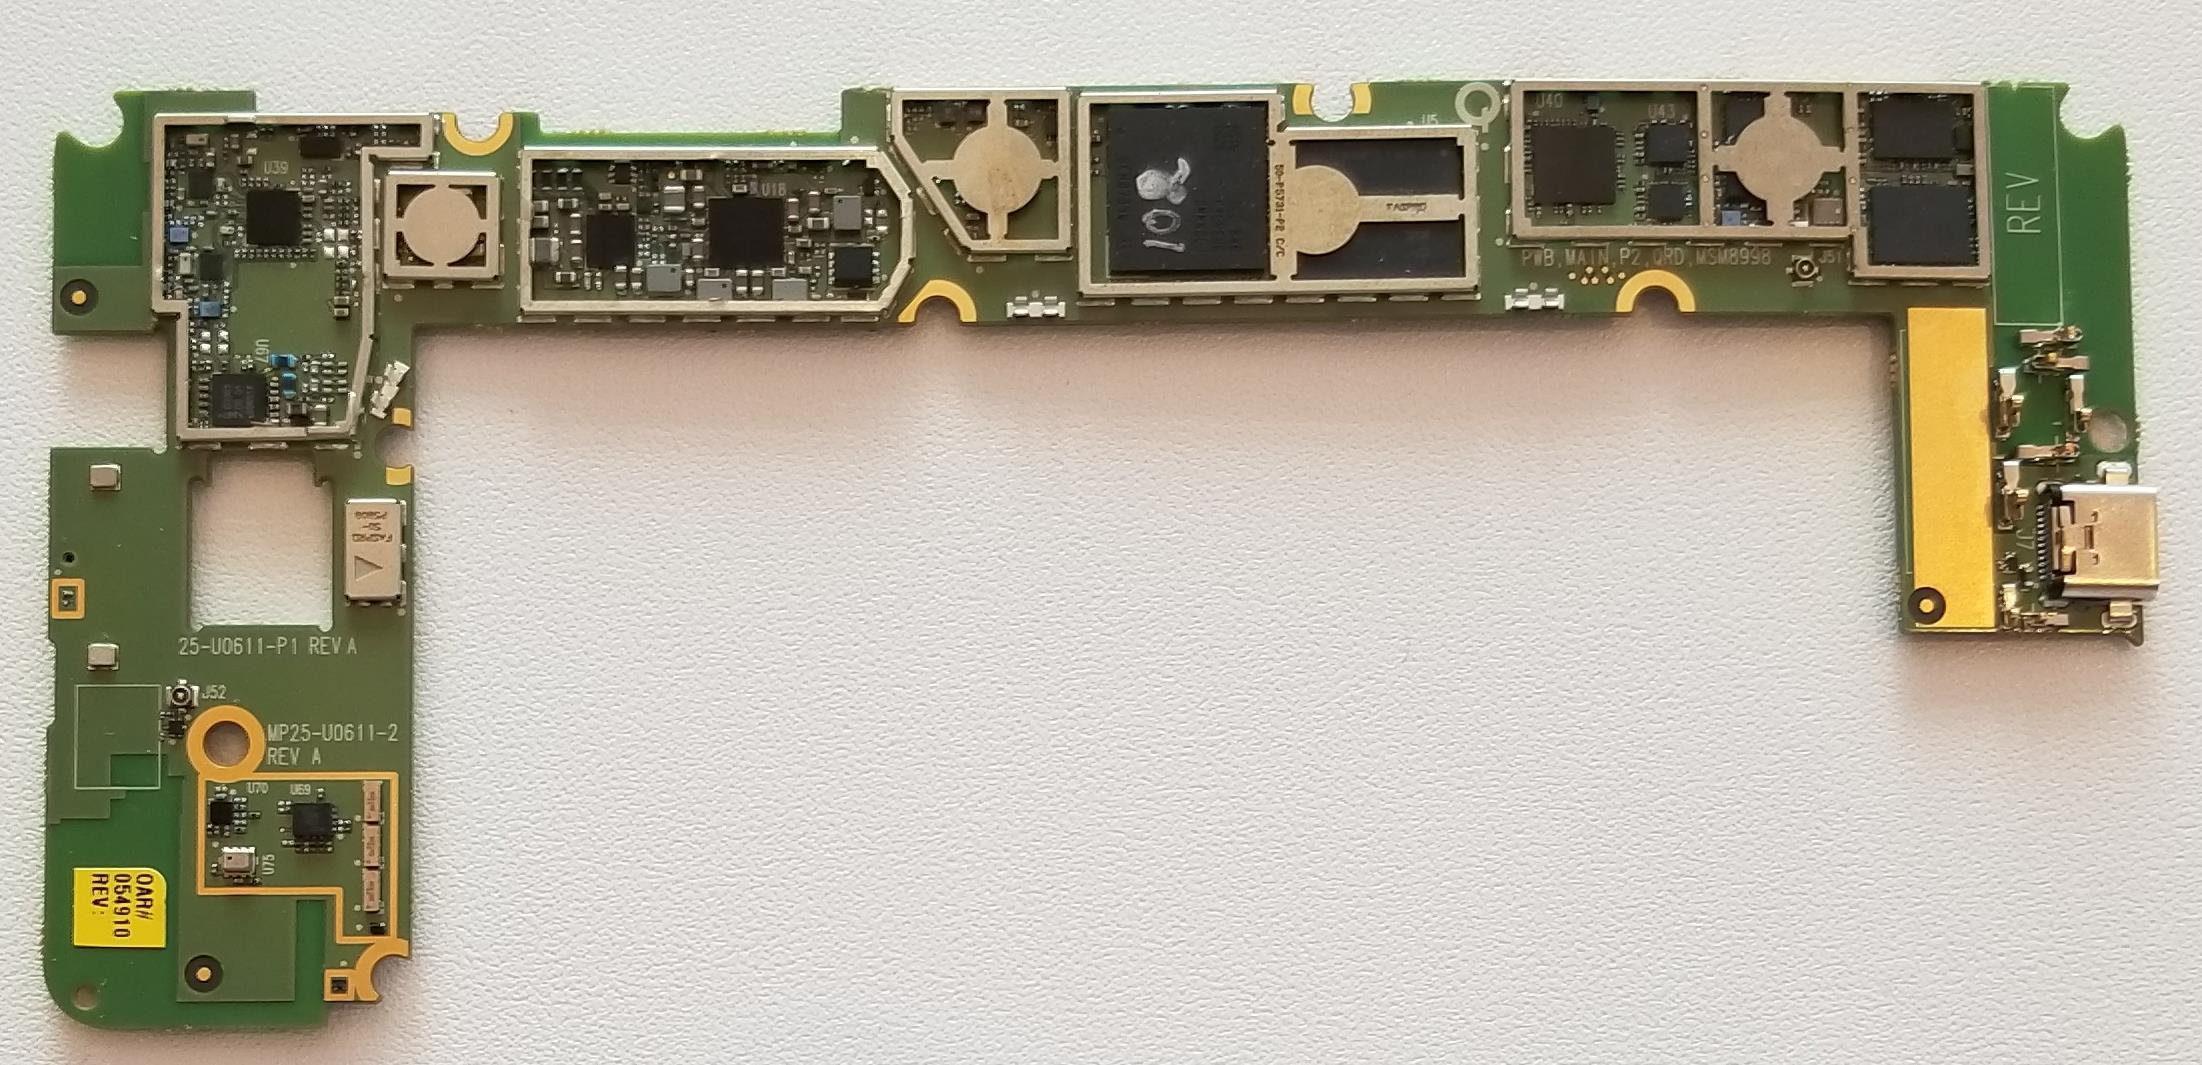 Qualcomm, Microsoft announce Snapdragon 835 PCs with gigabit LTE